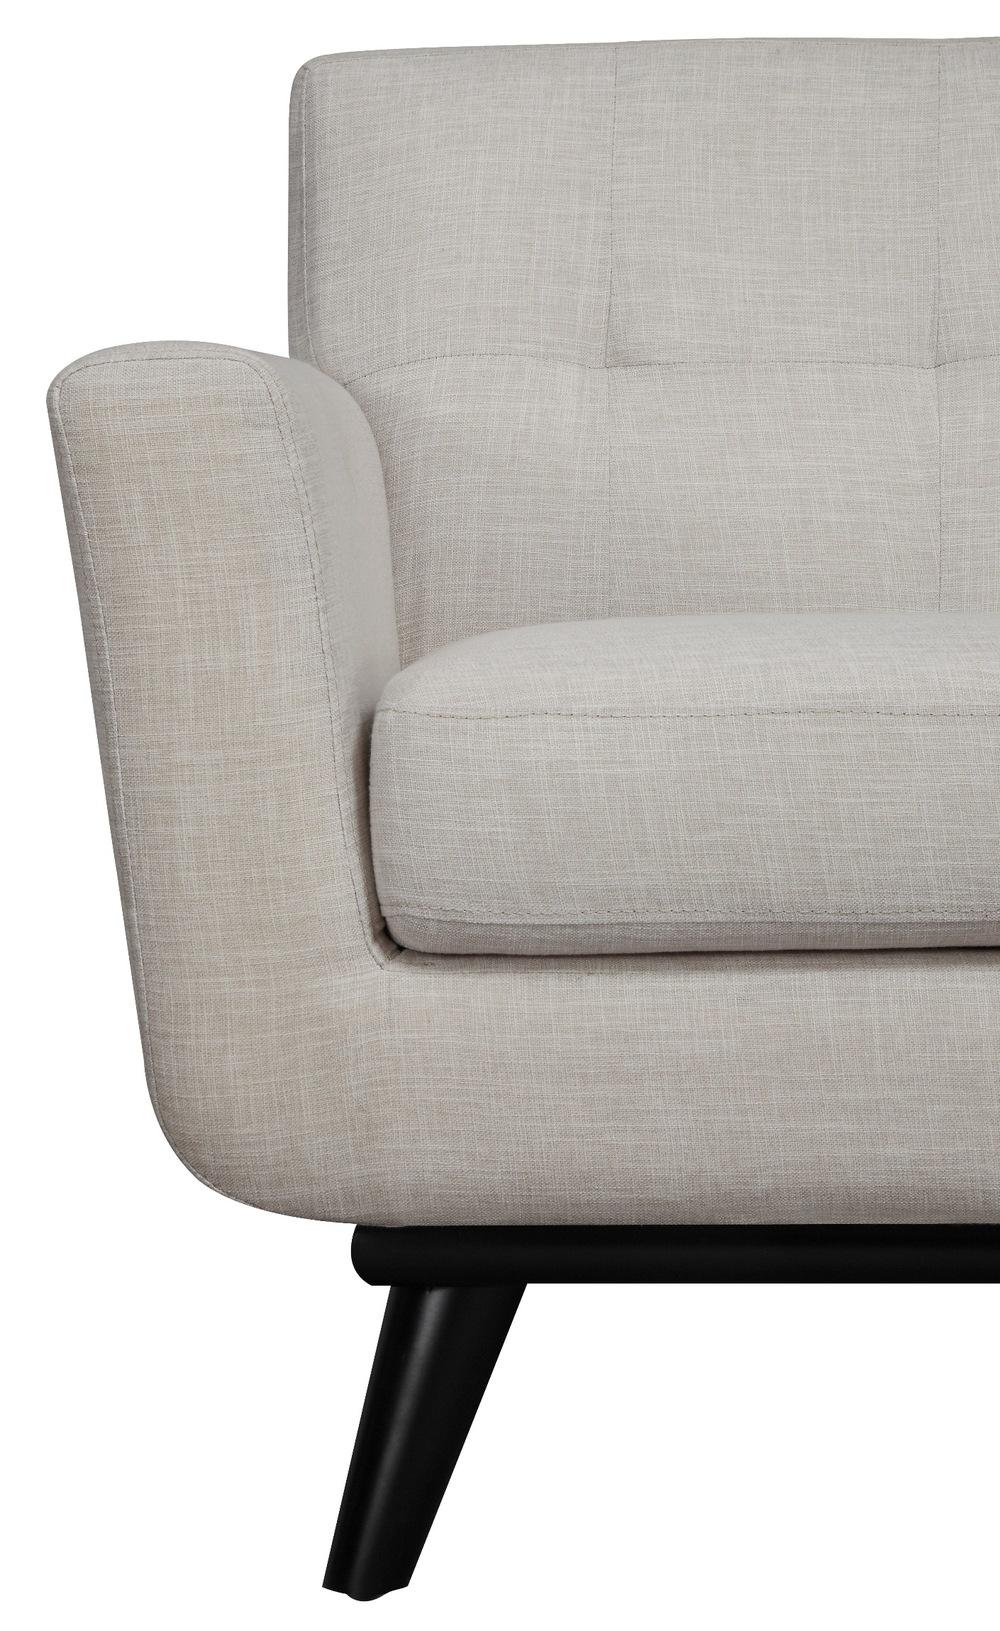 TOV Furniture - James Beige Linen Chair